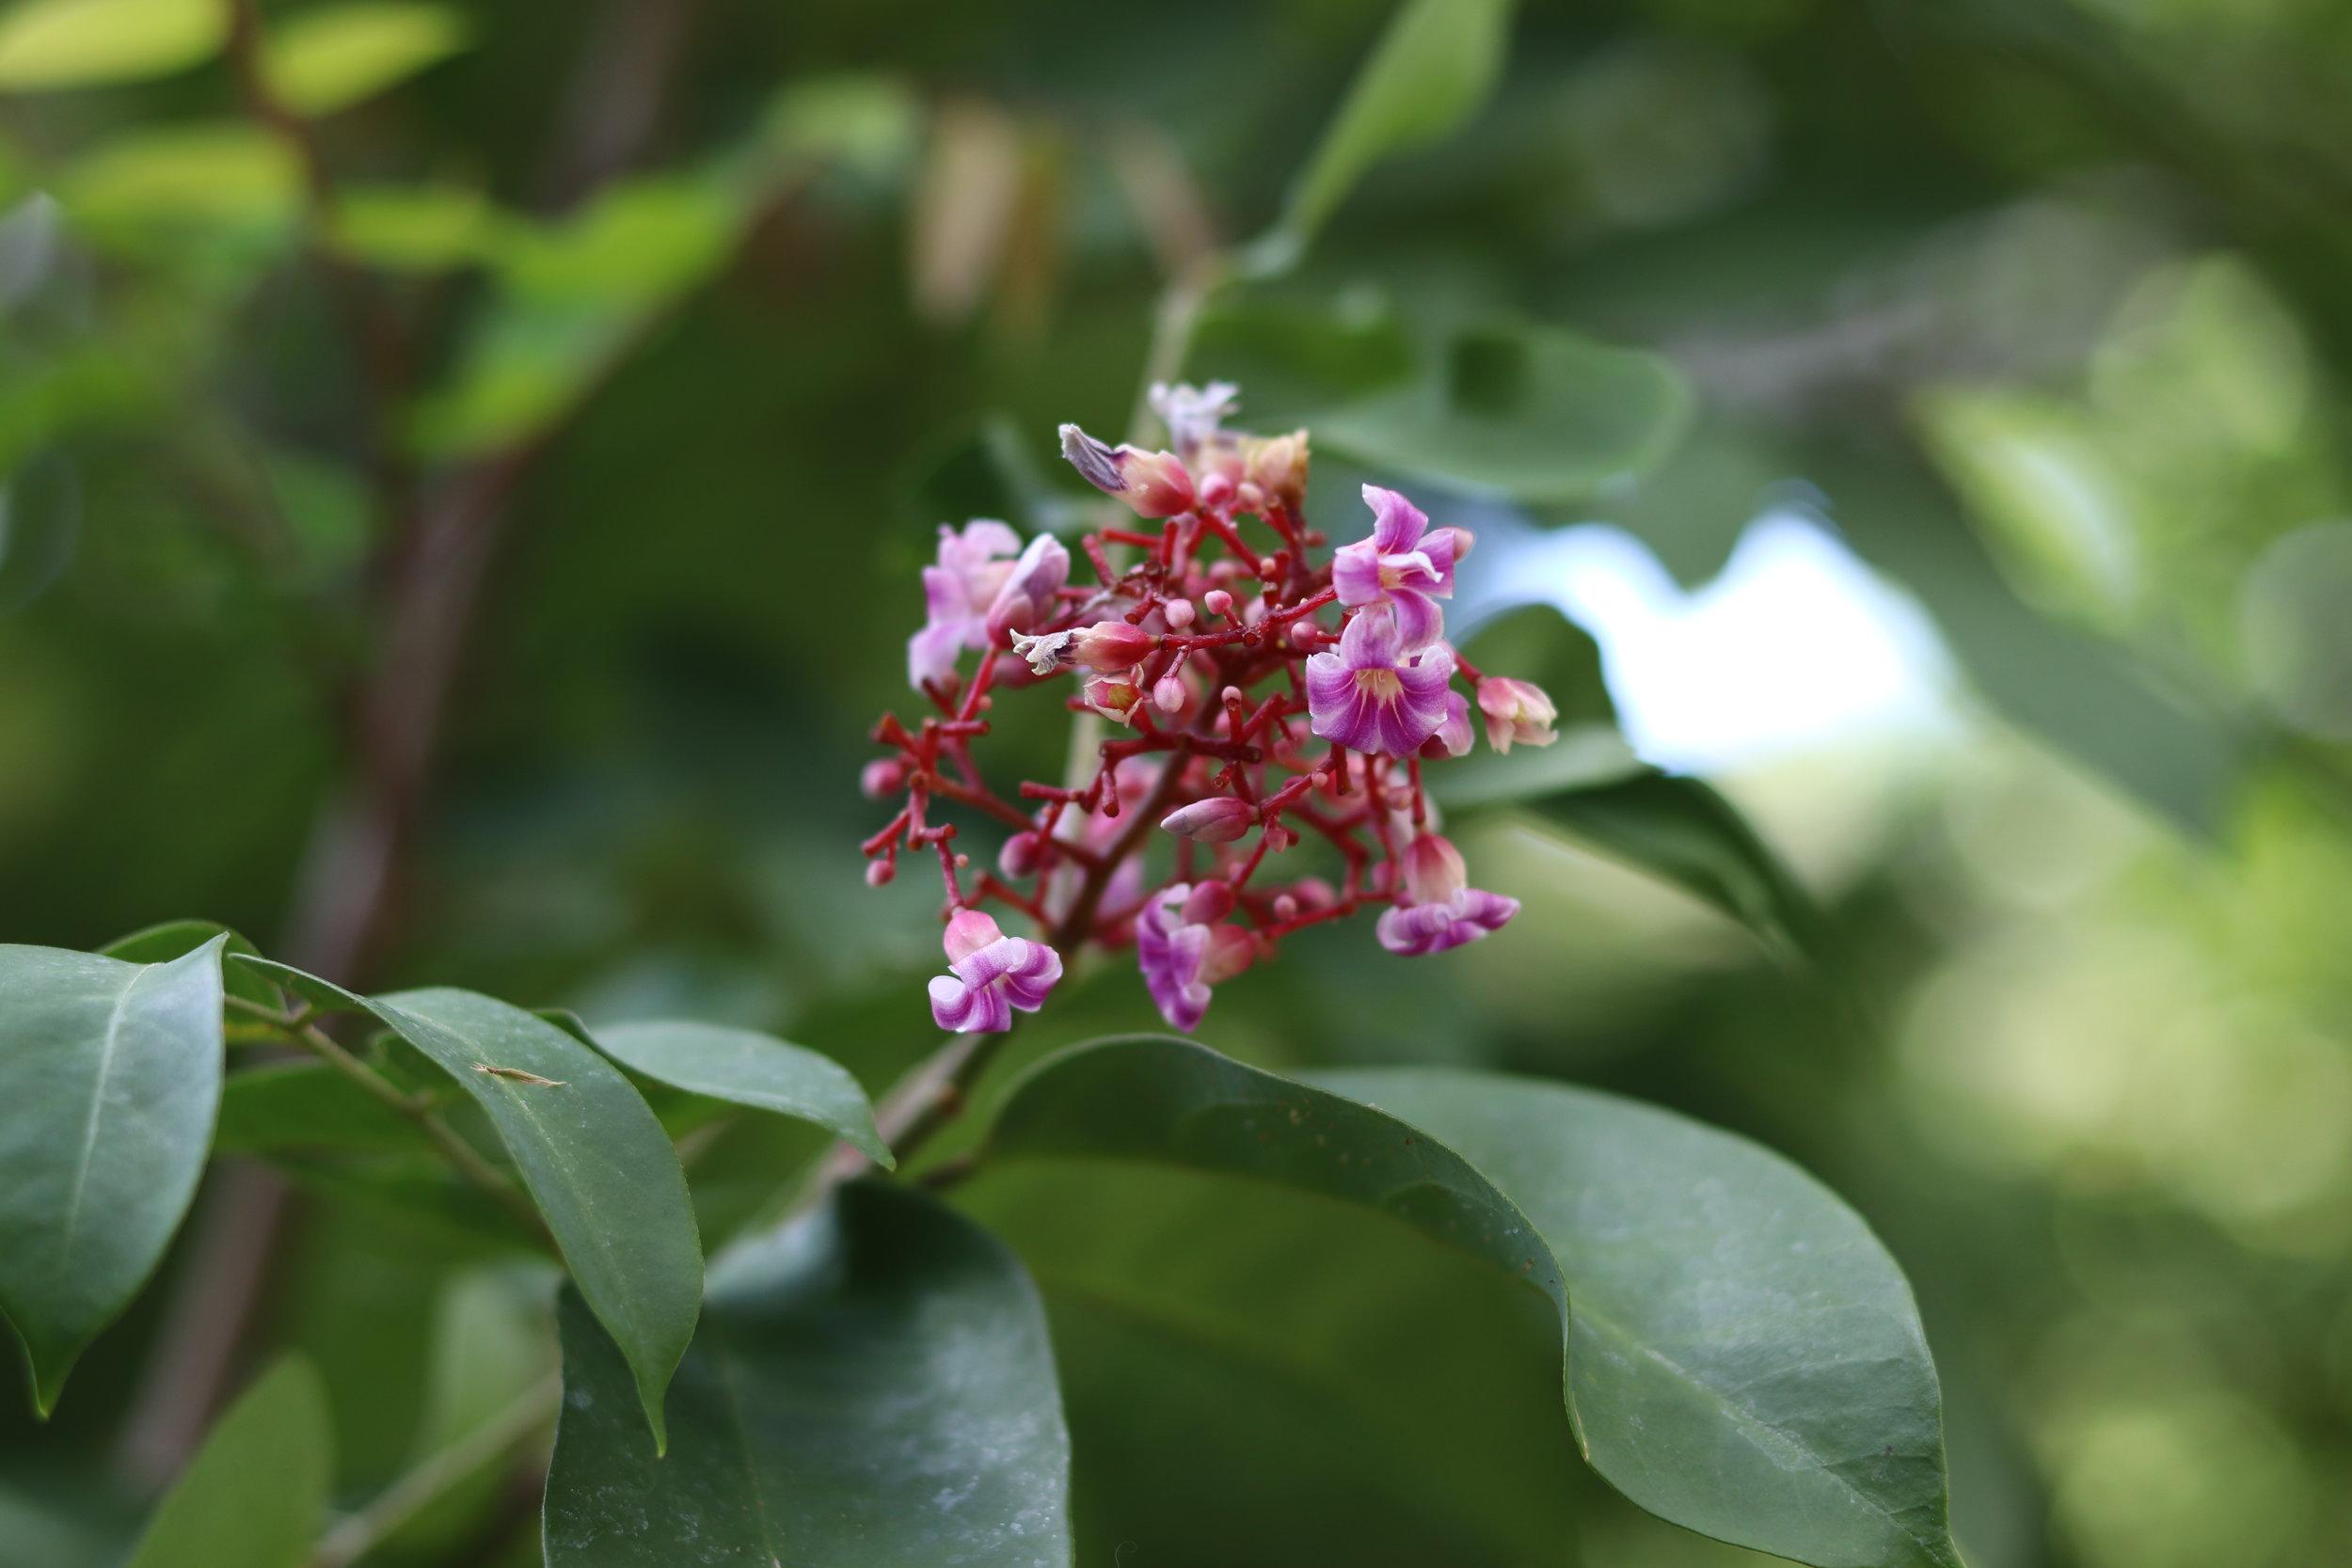 Starfurit flowers.